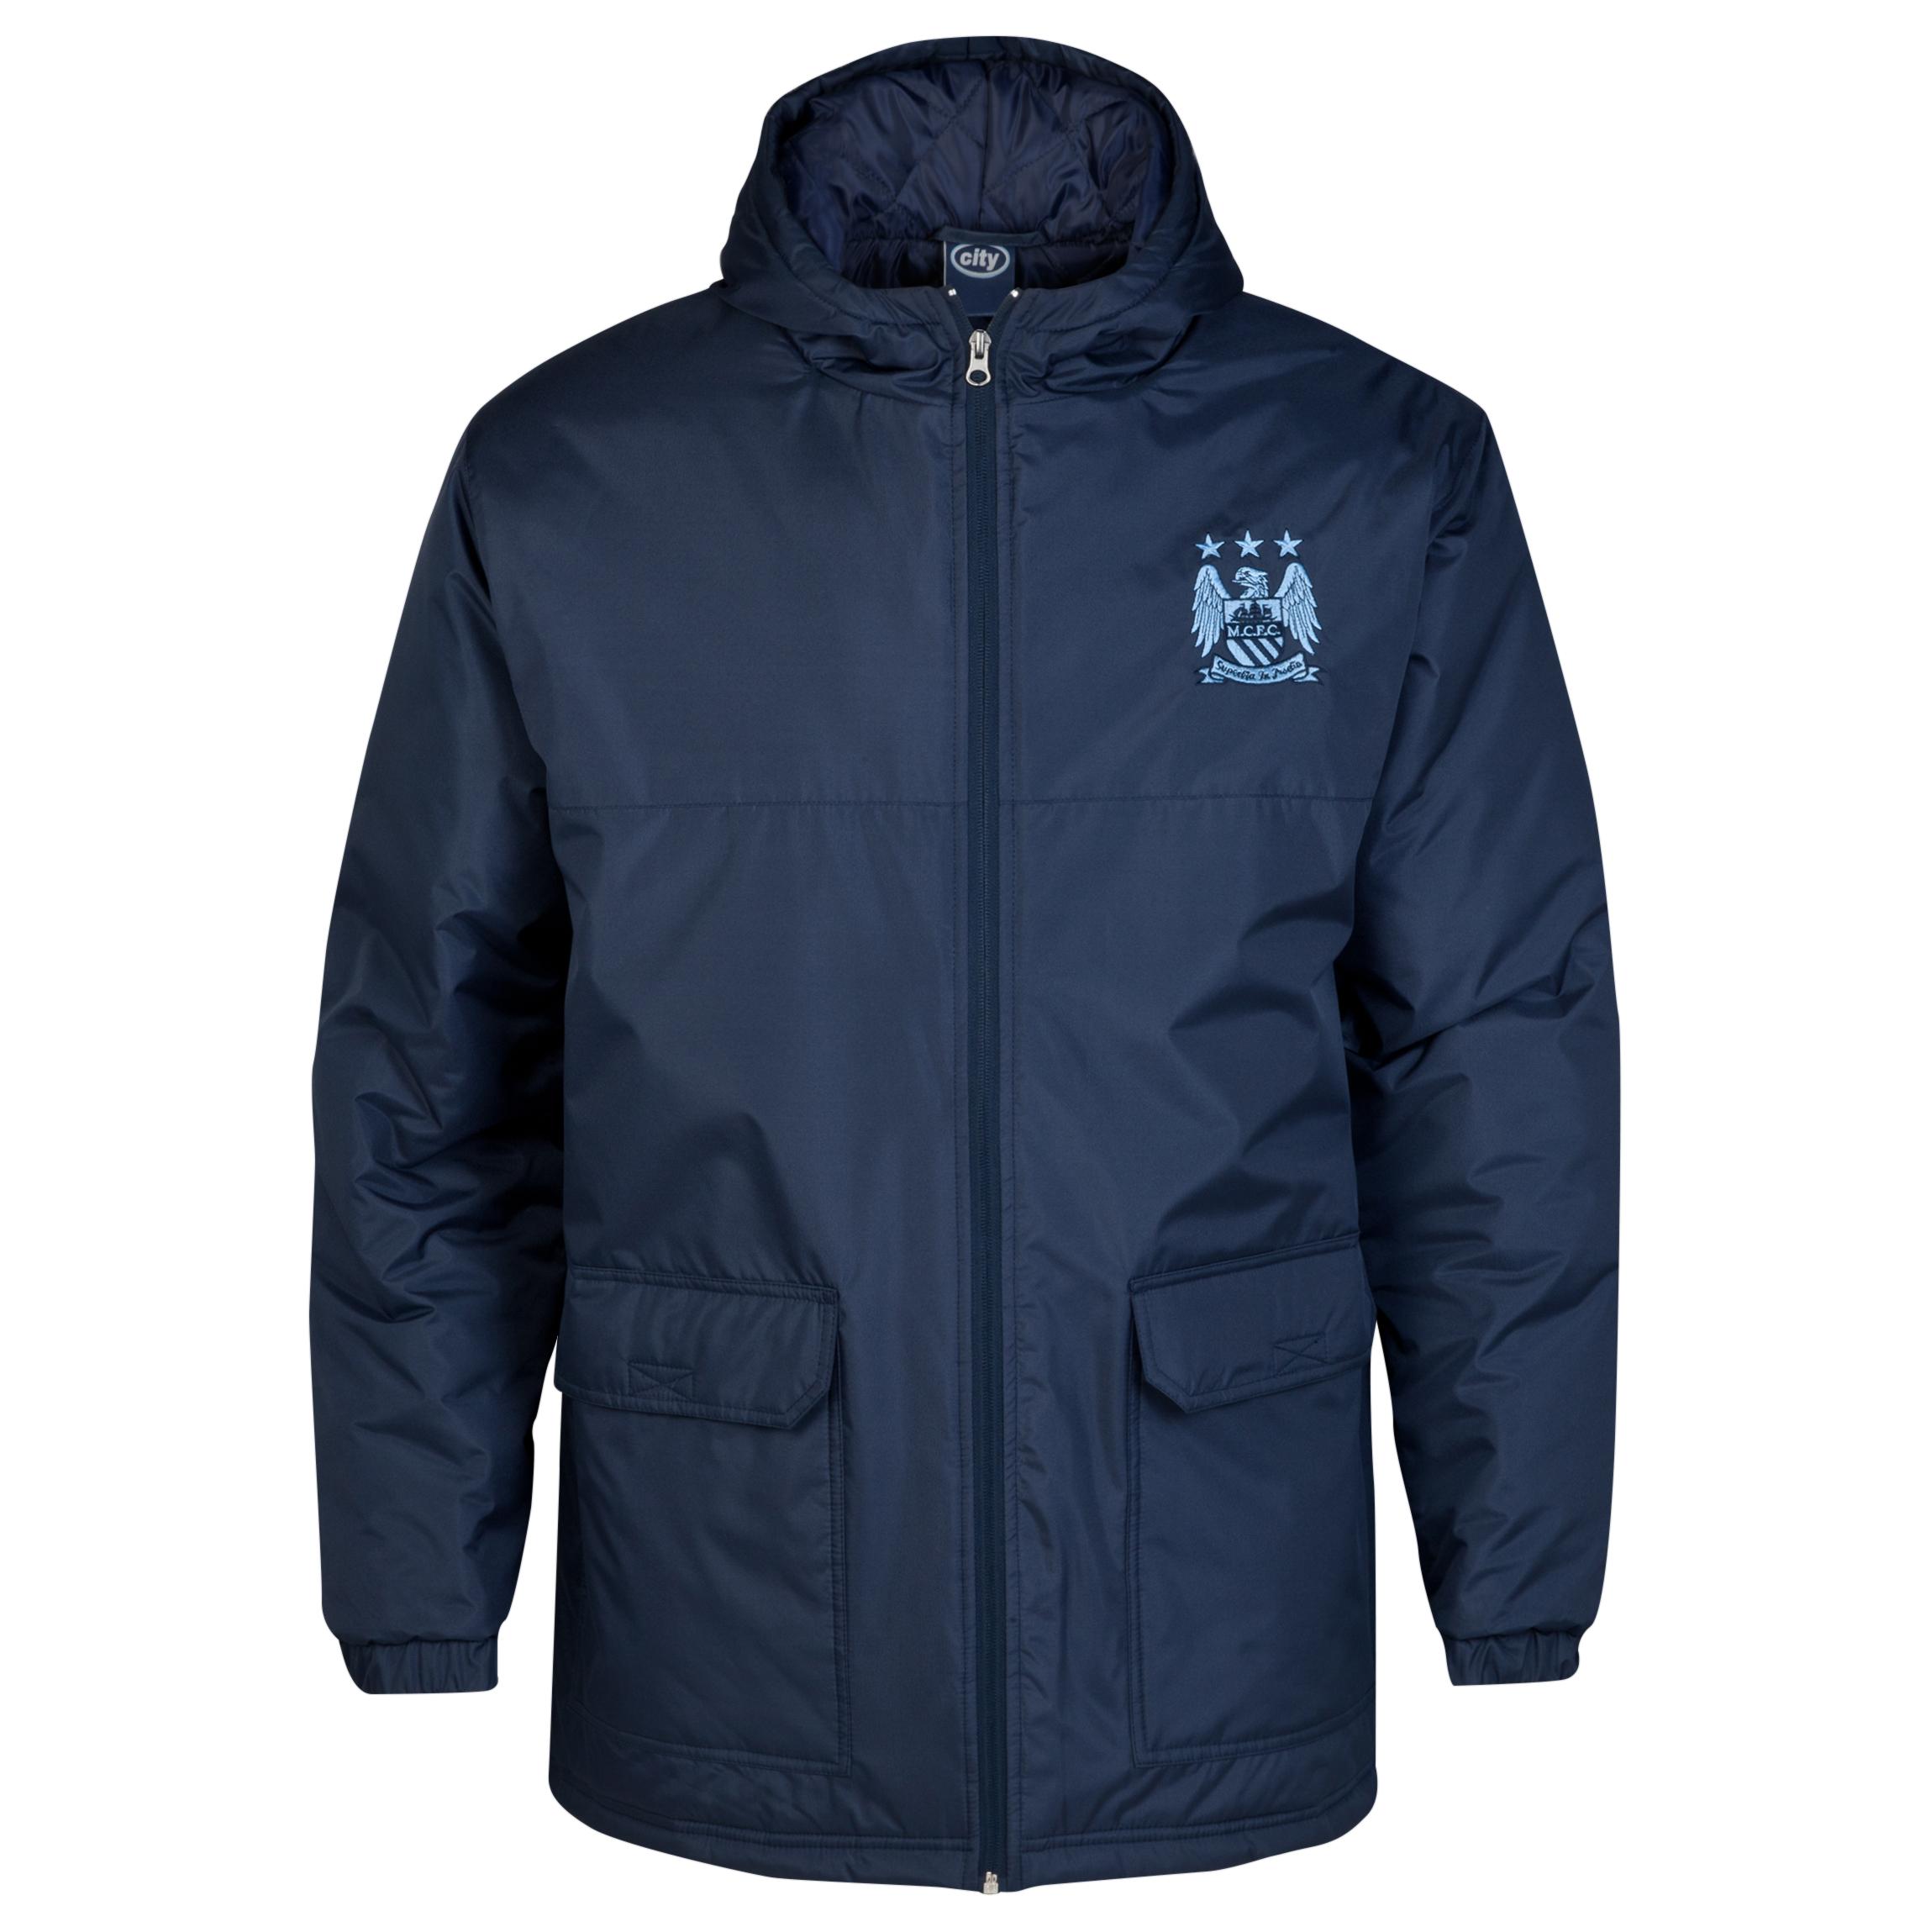 Manchester City Padded Jacket - Navy - Infant Boys